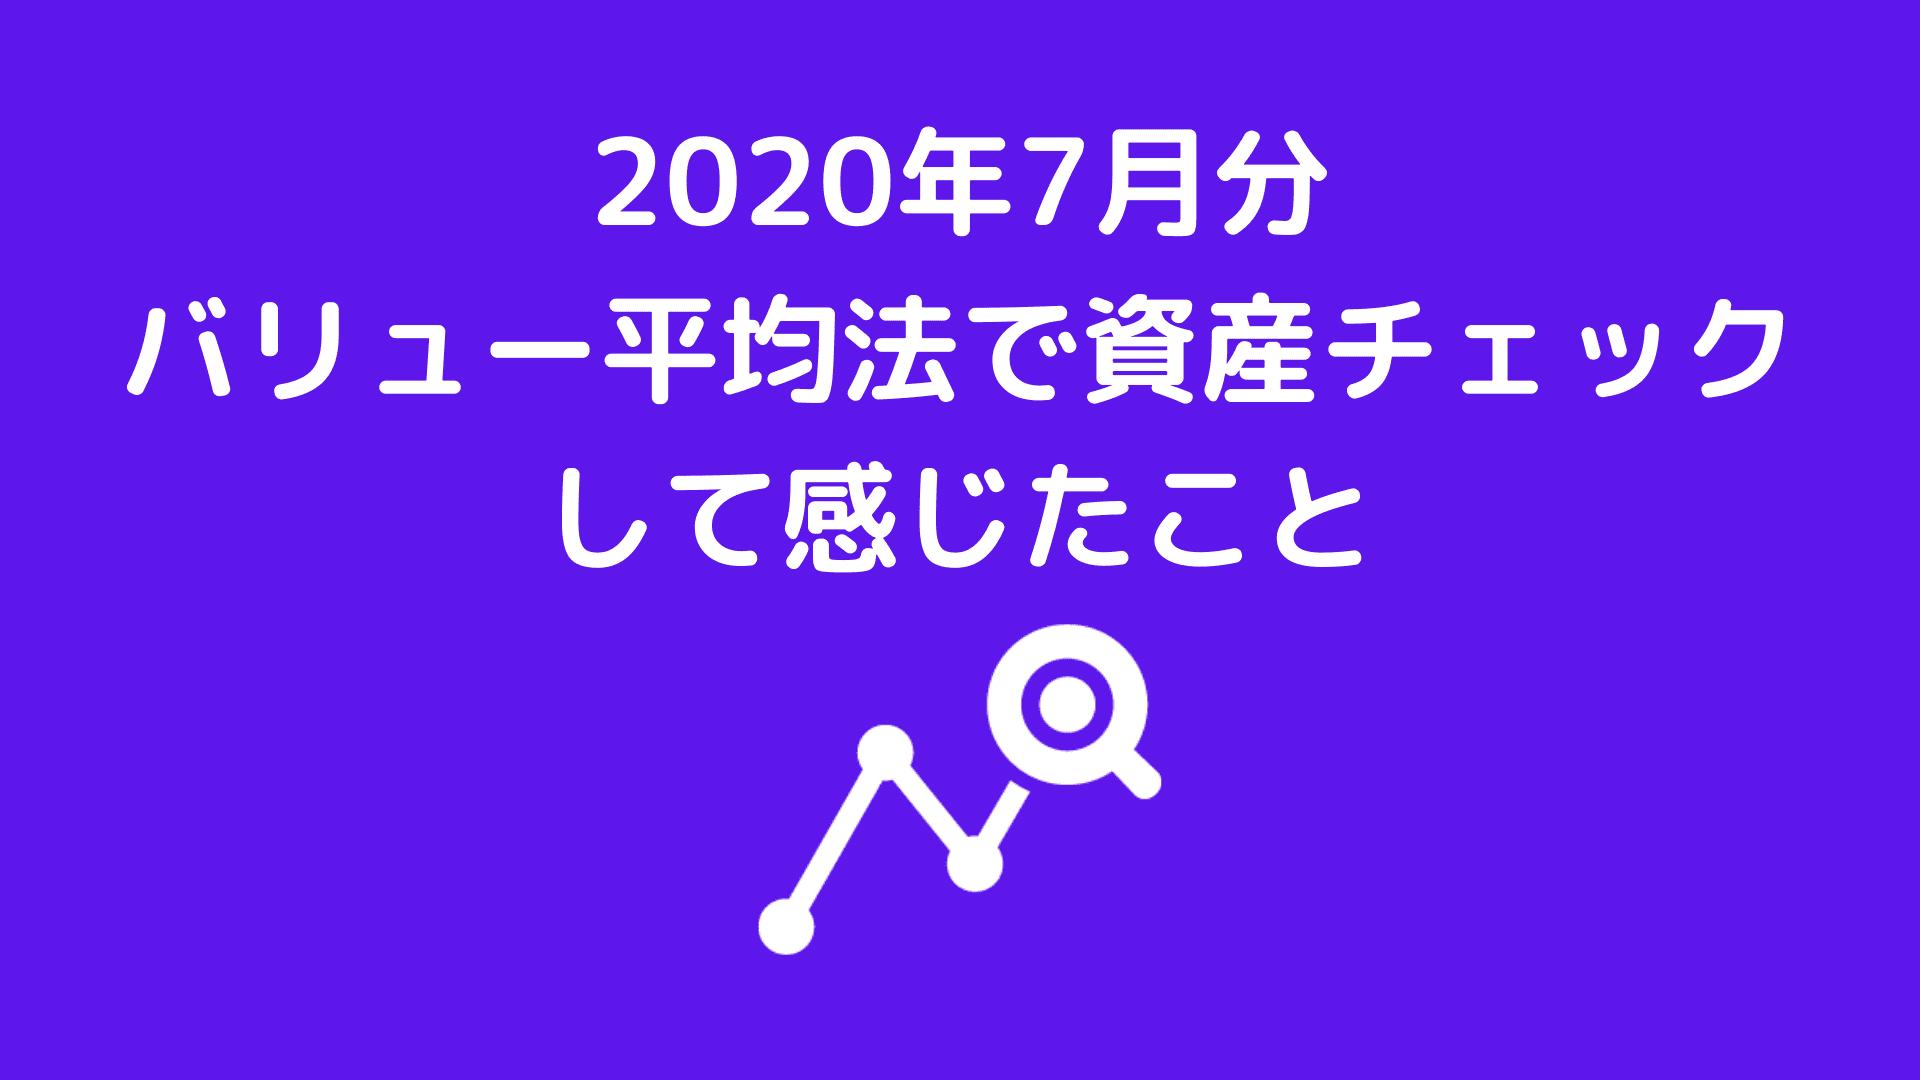 0001 8913239586